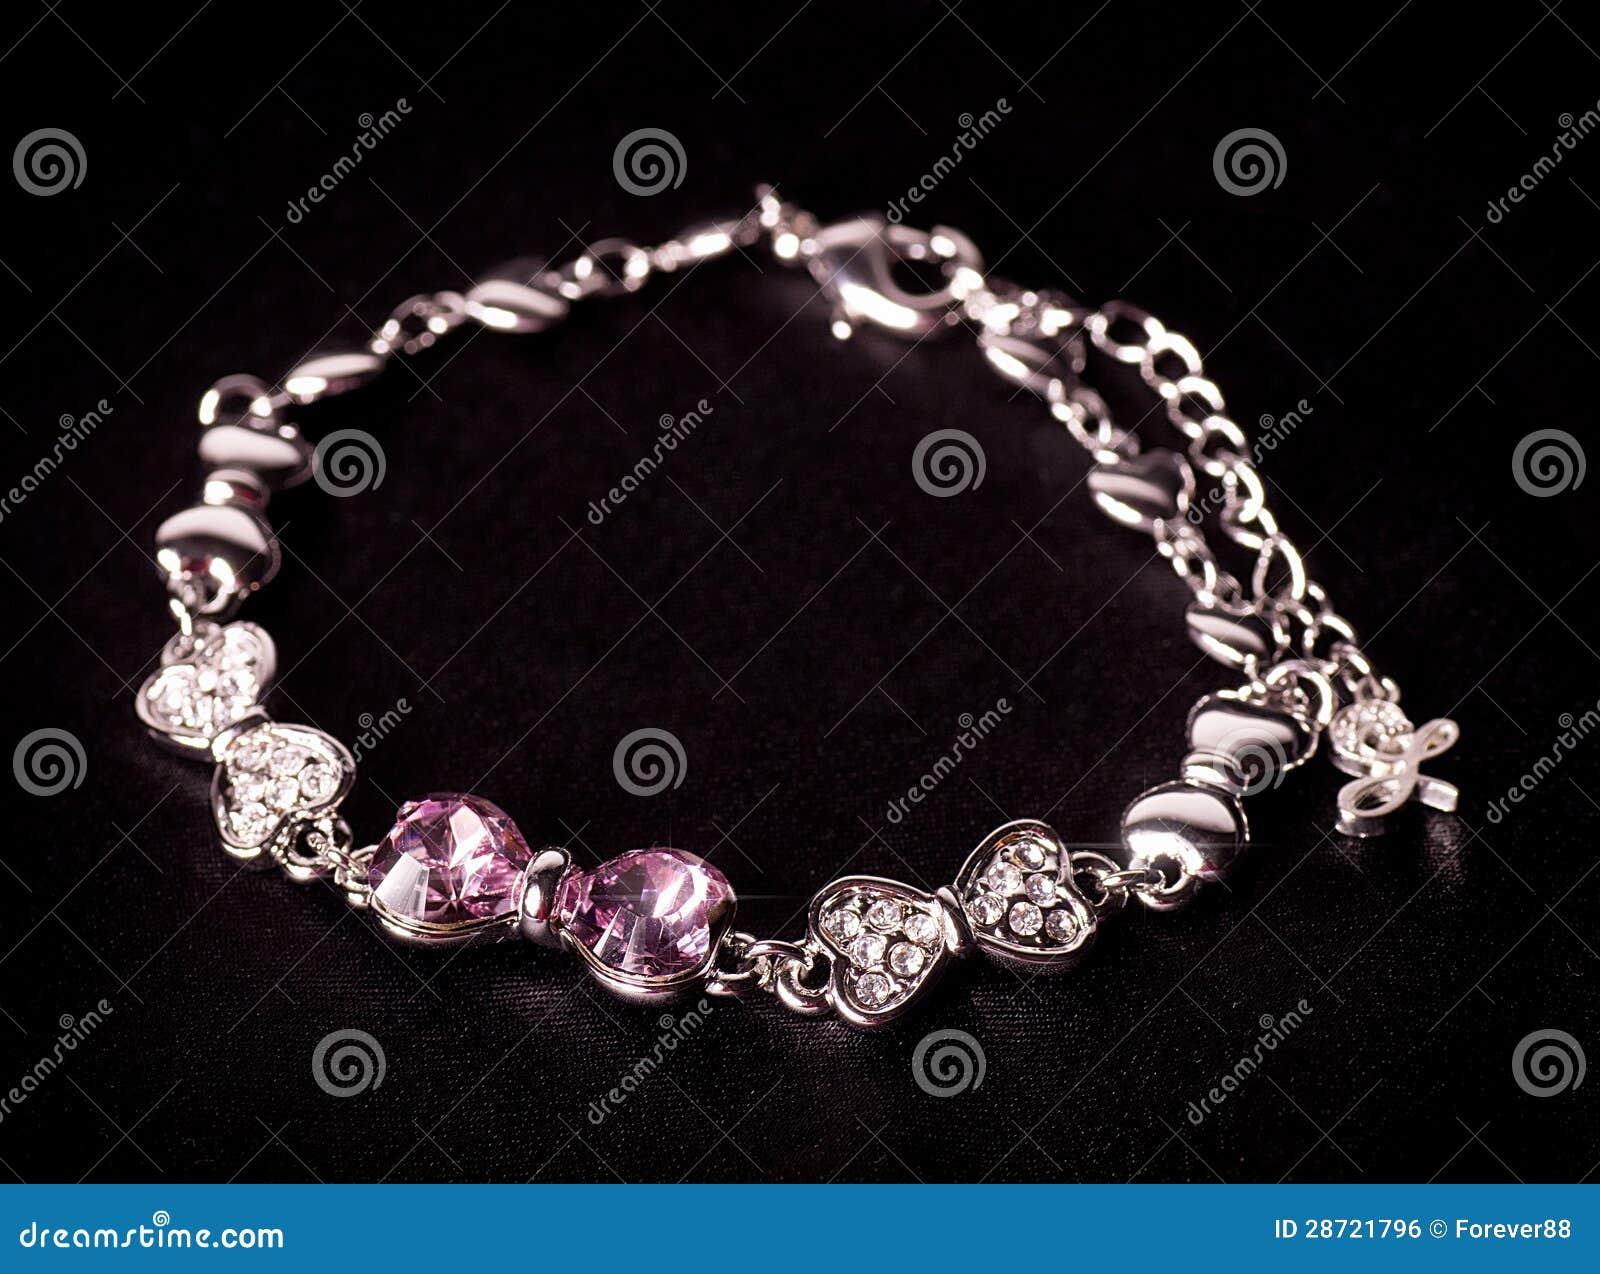 Beautiful Jewelry On Background Stock Photo - Image: 28721796